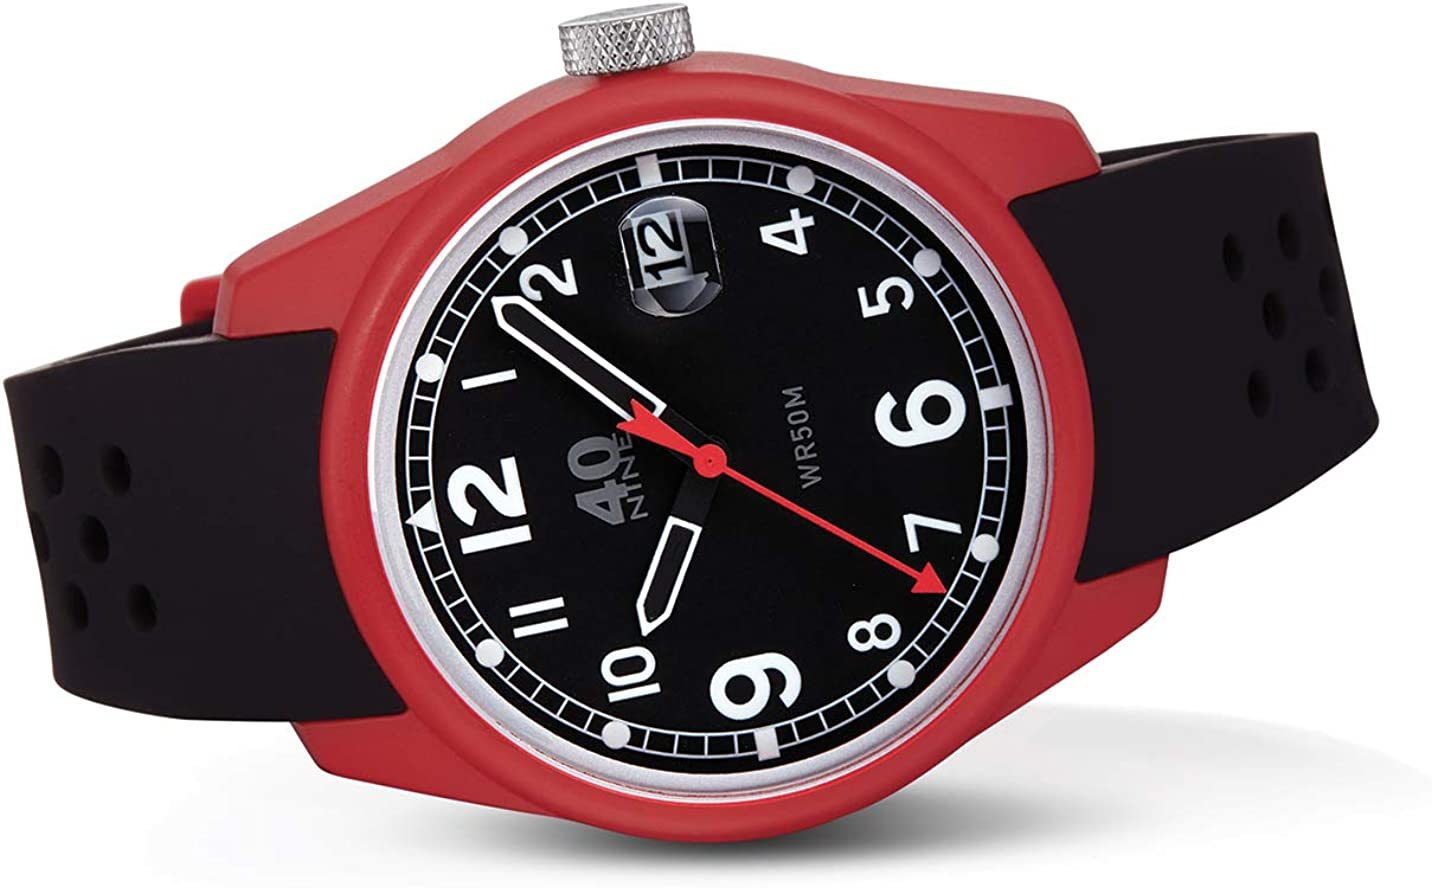 40N7.0BK Mens 43MM Spartan Watch, Black Face, Black Strap